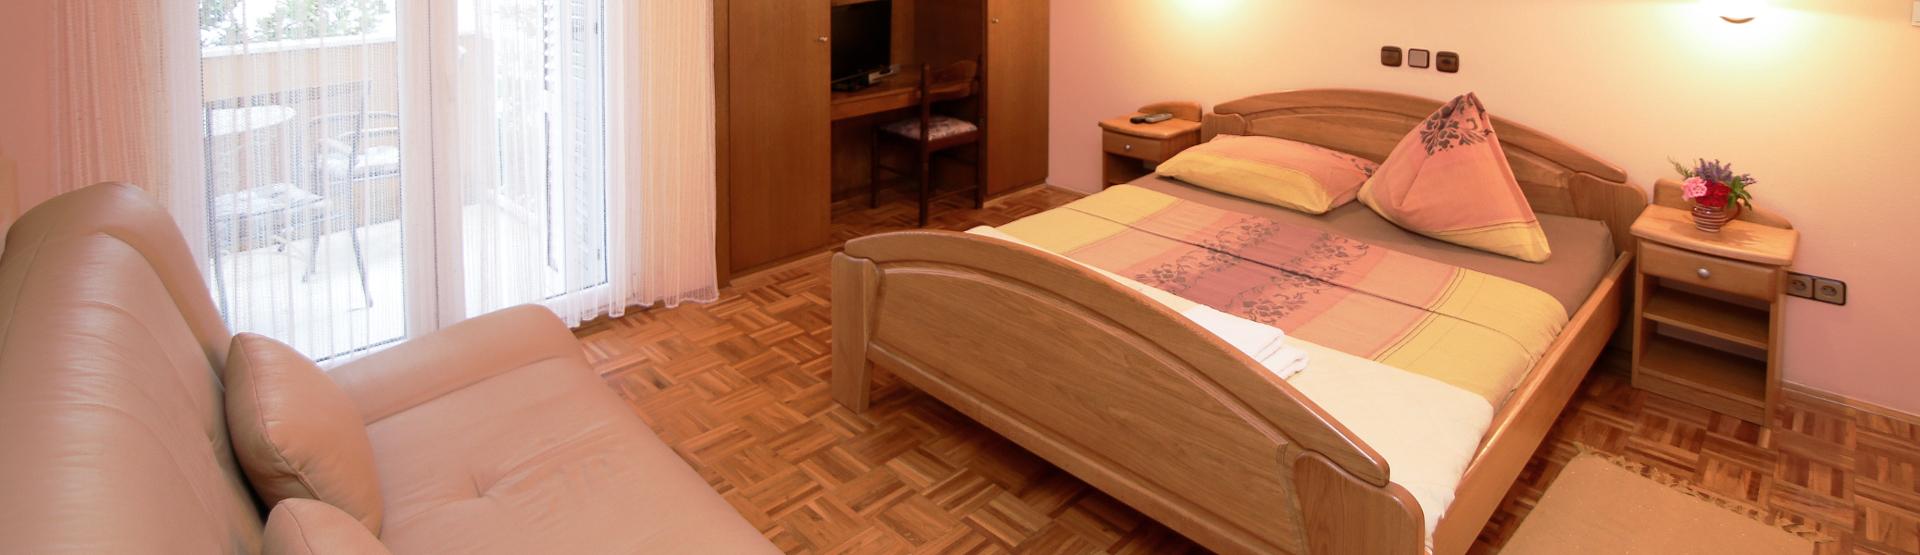 room 5 pansion adria